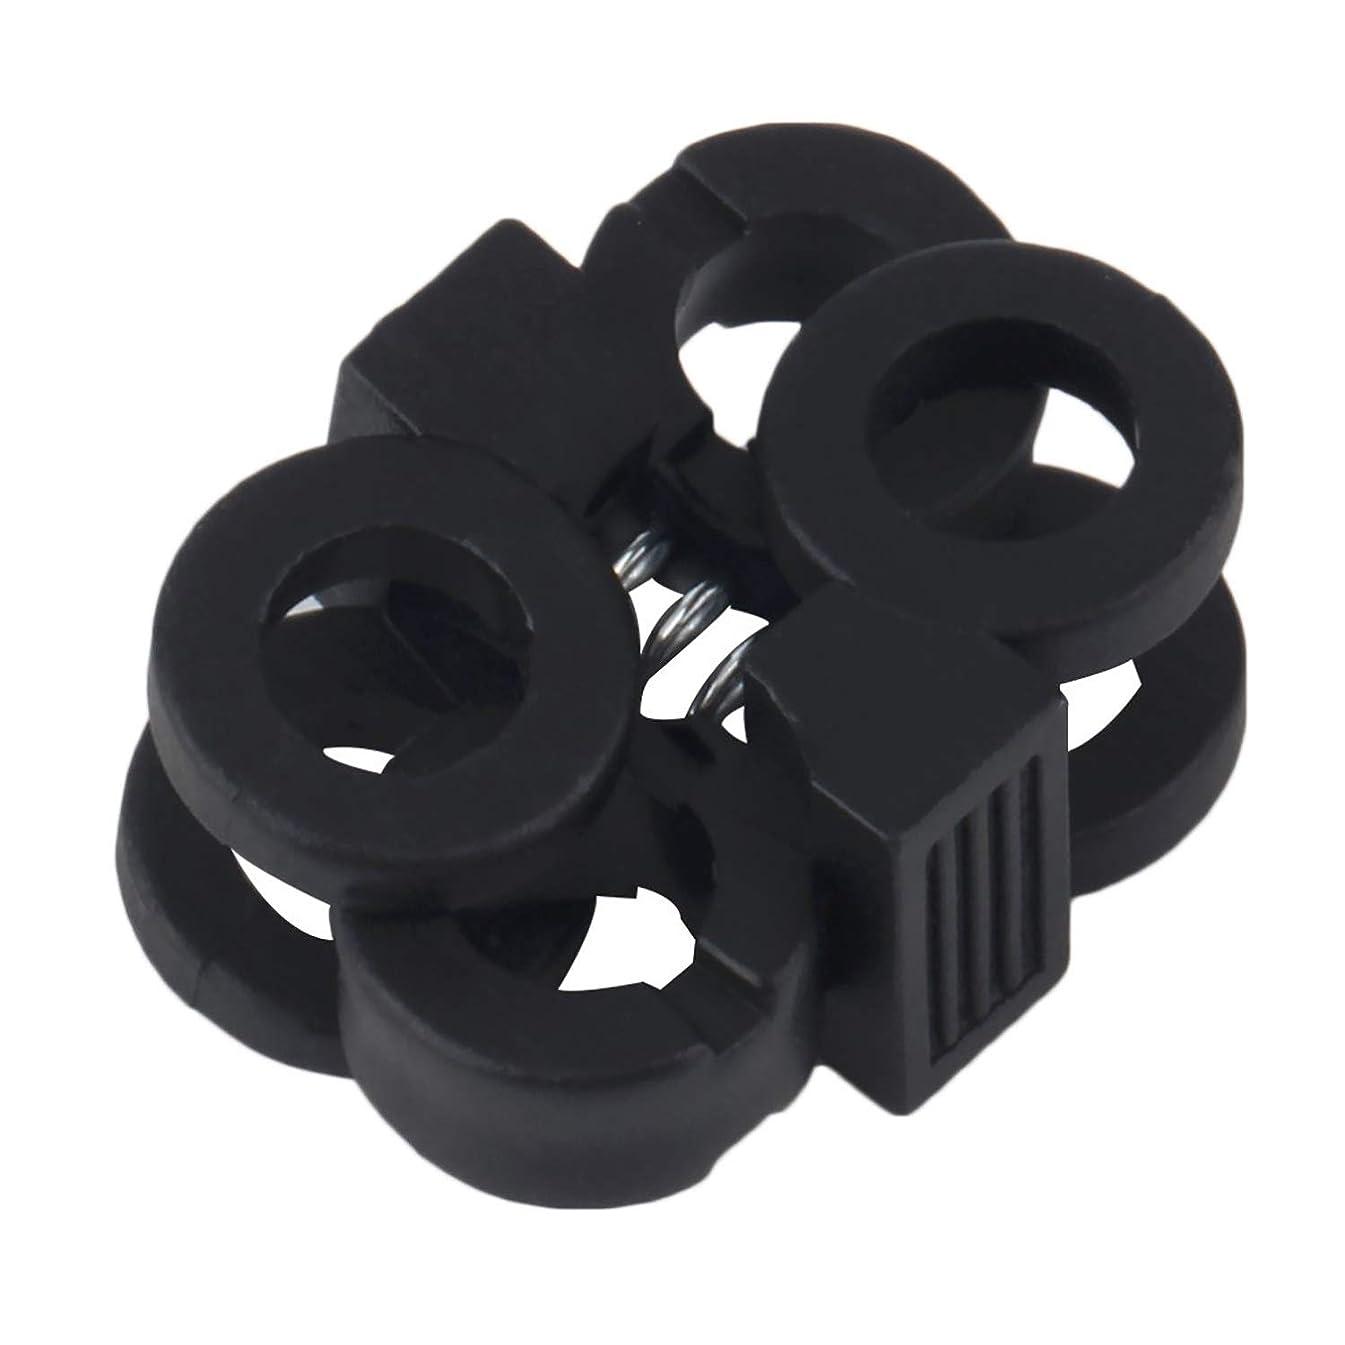 Plastic Cord Locks Non-Slip Shoe Buckle End Toggle Double Hole Spring Stopper Fastener Slider …